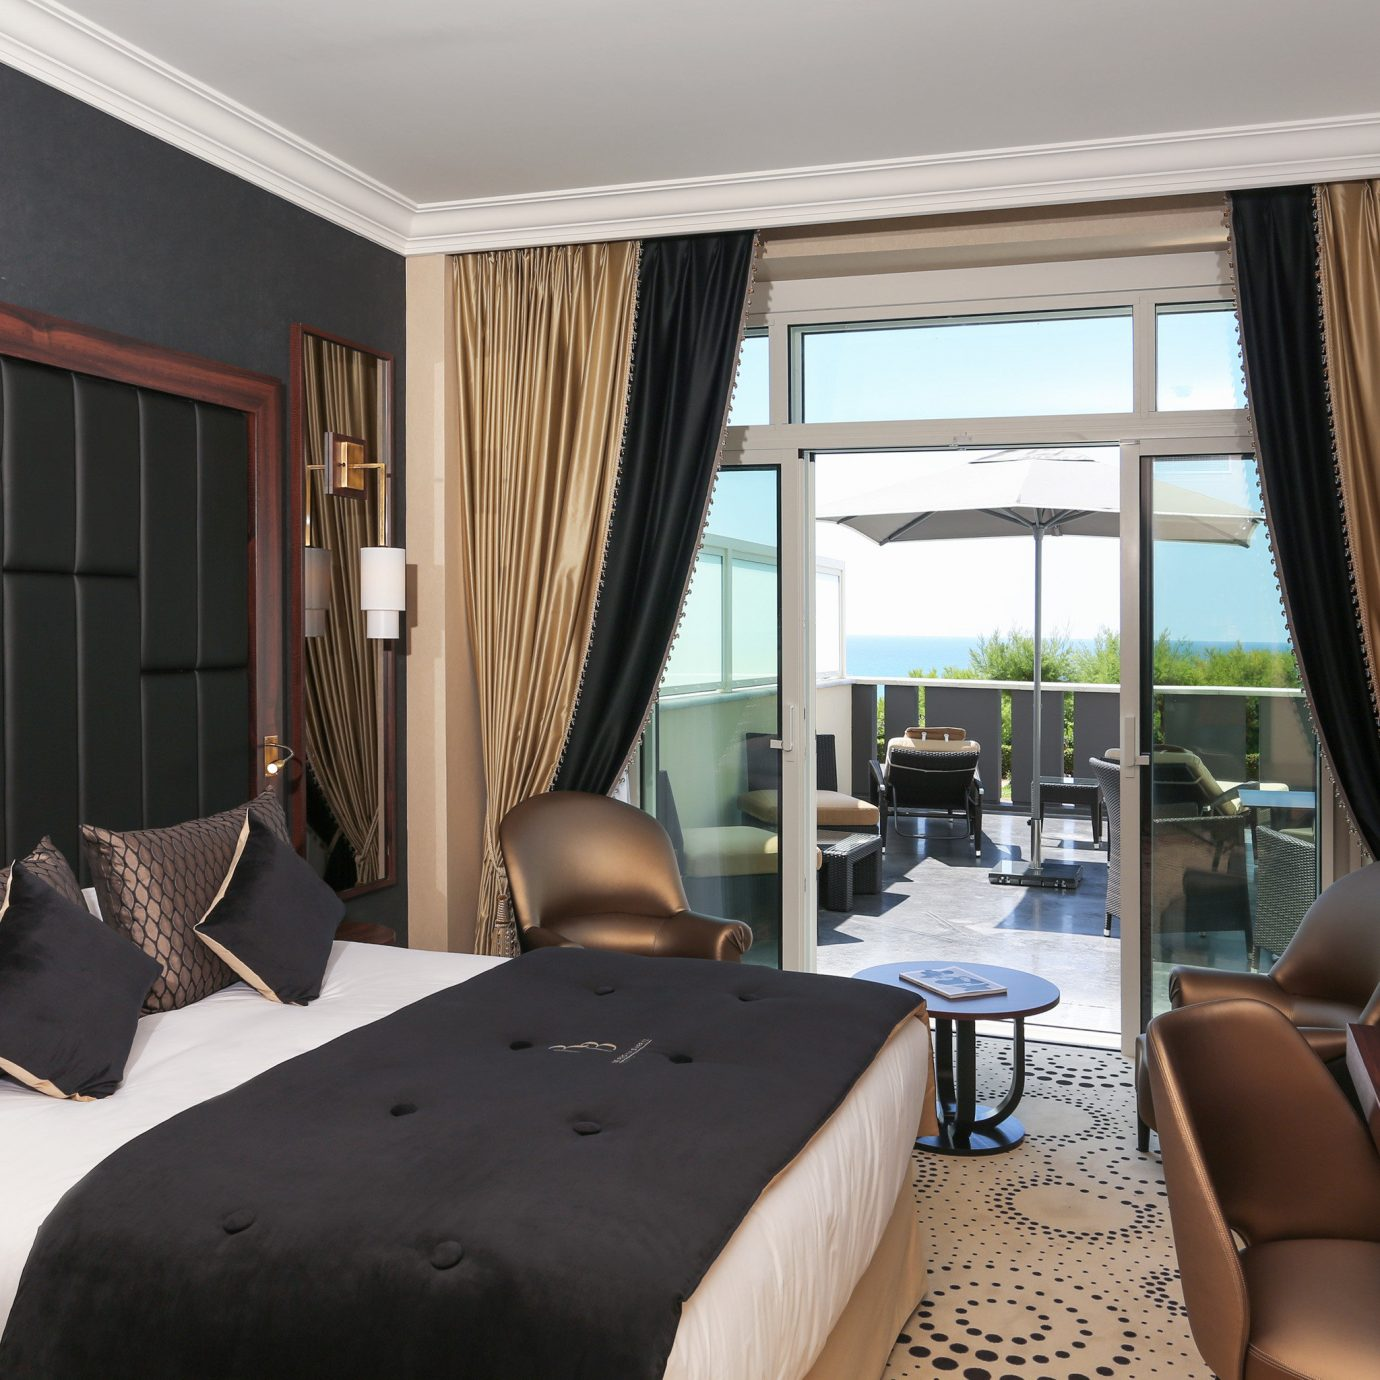 Balcony Bedroom Luxury Modern Resort Scenic views chair property Suite living room condominium home cottage